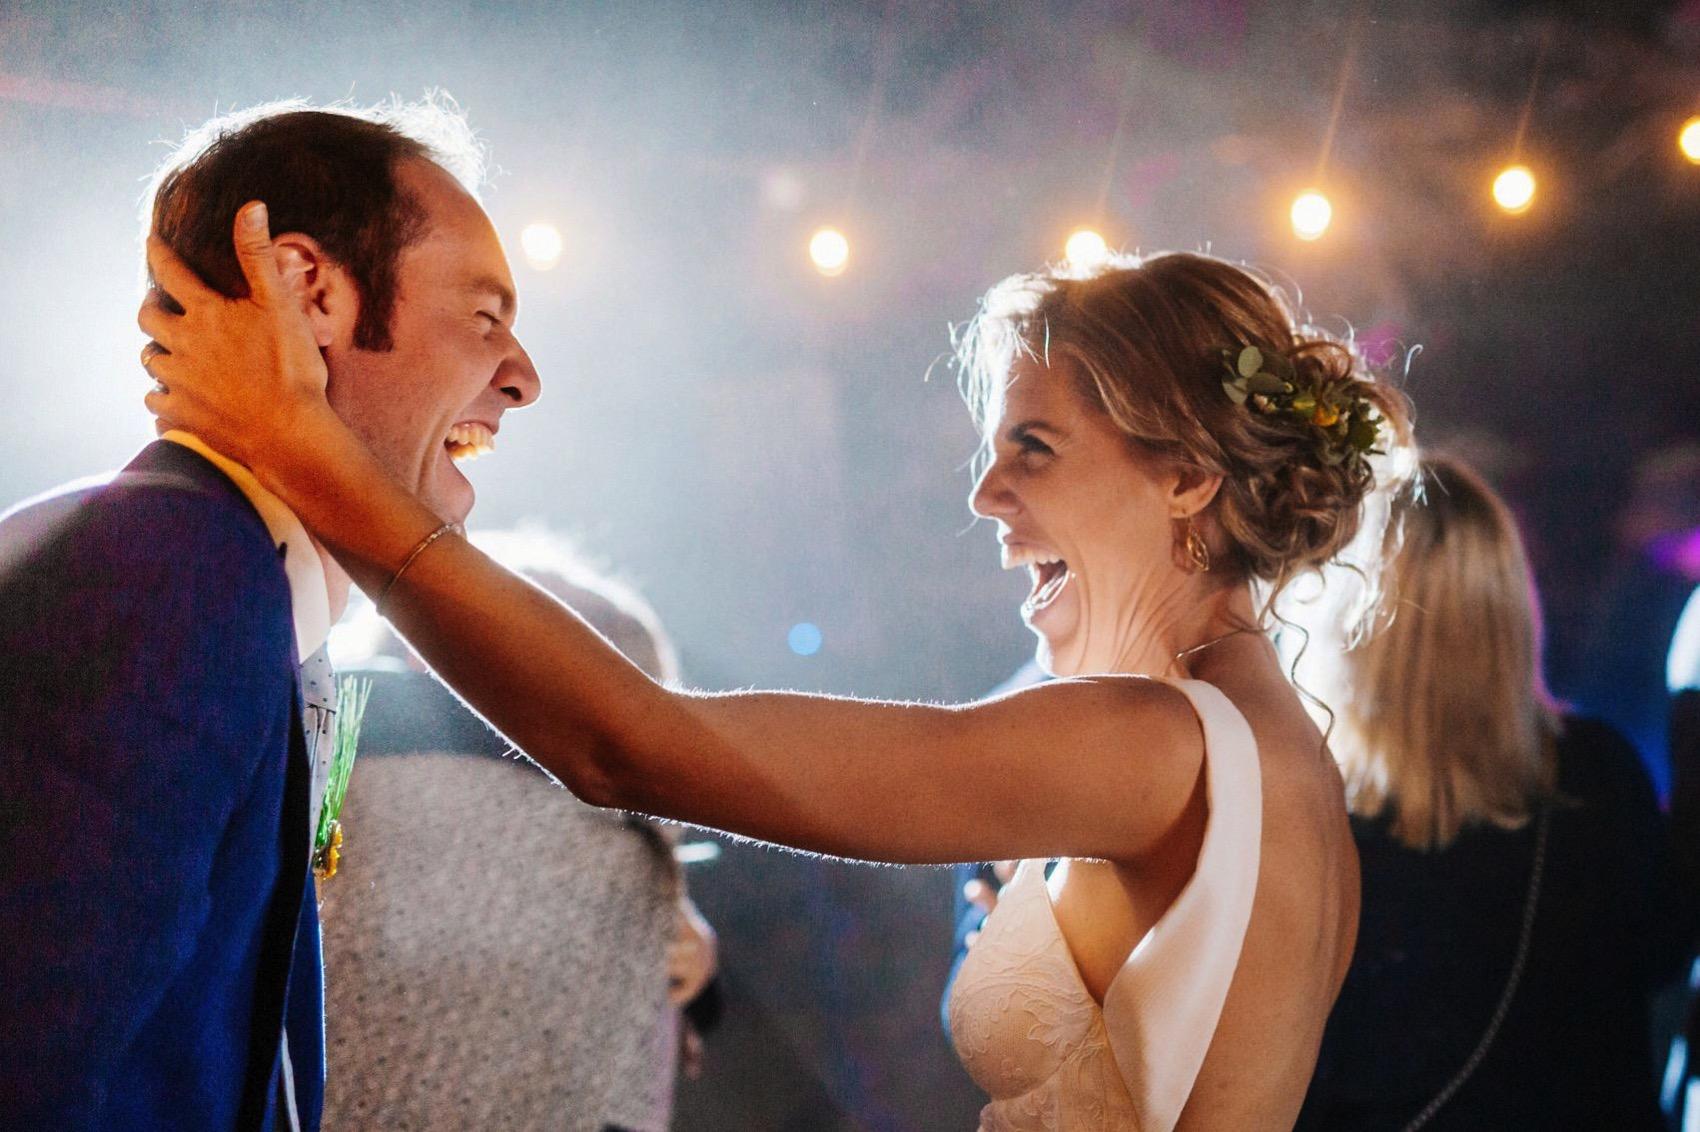 camp-shaffer-wedding-the-goodness-photo-198-photo.jpg